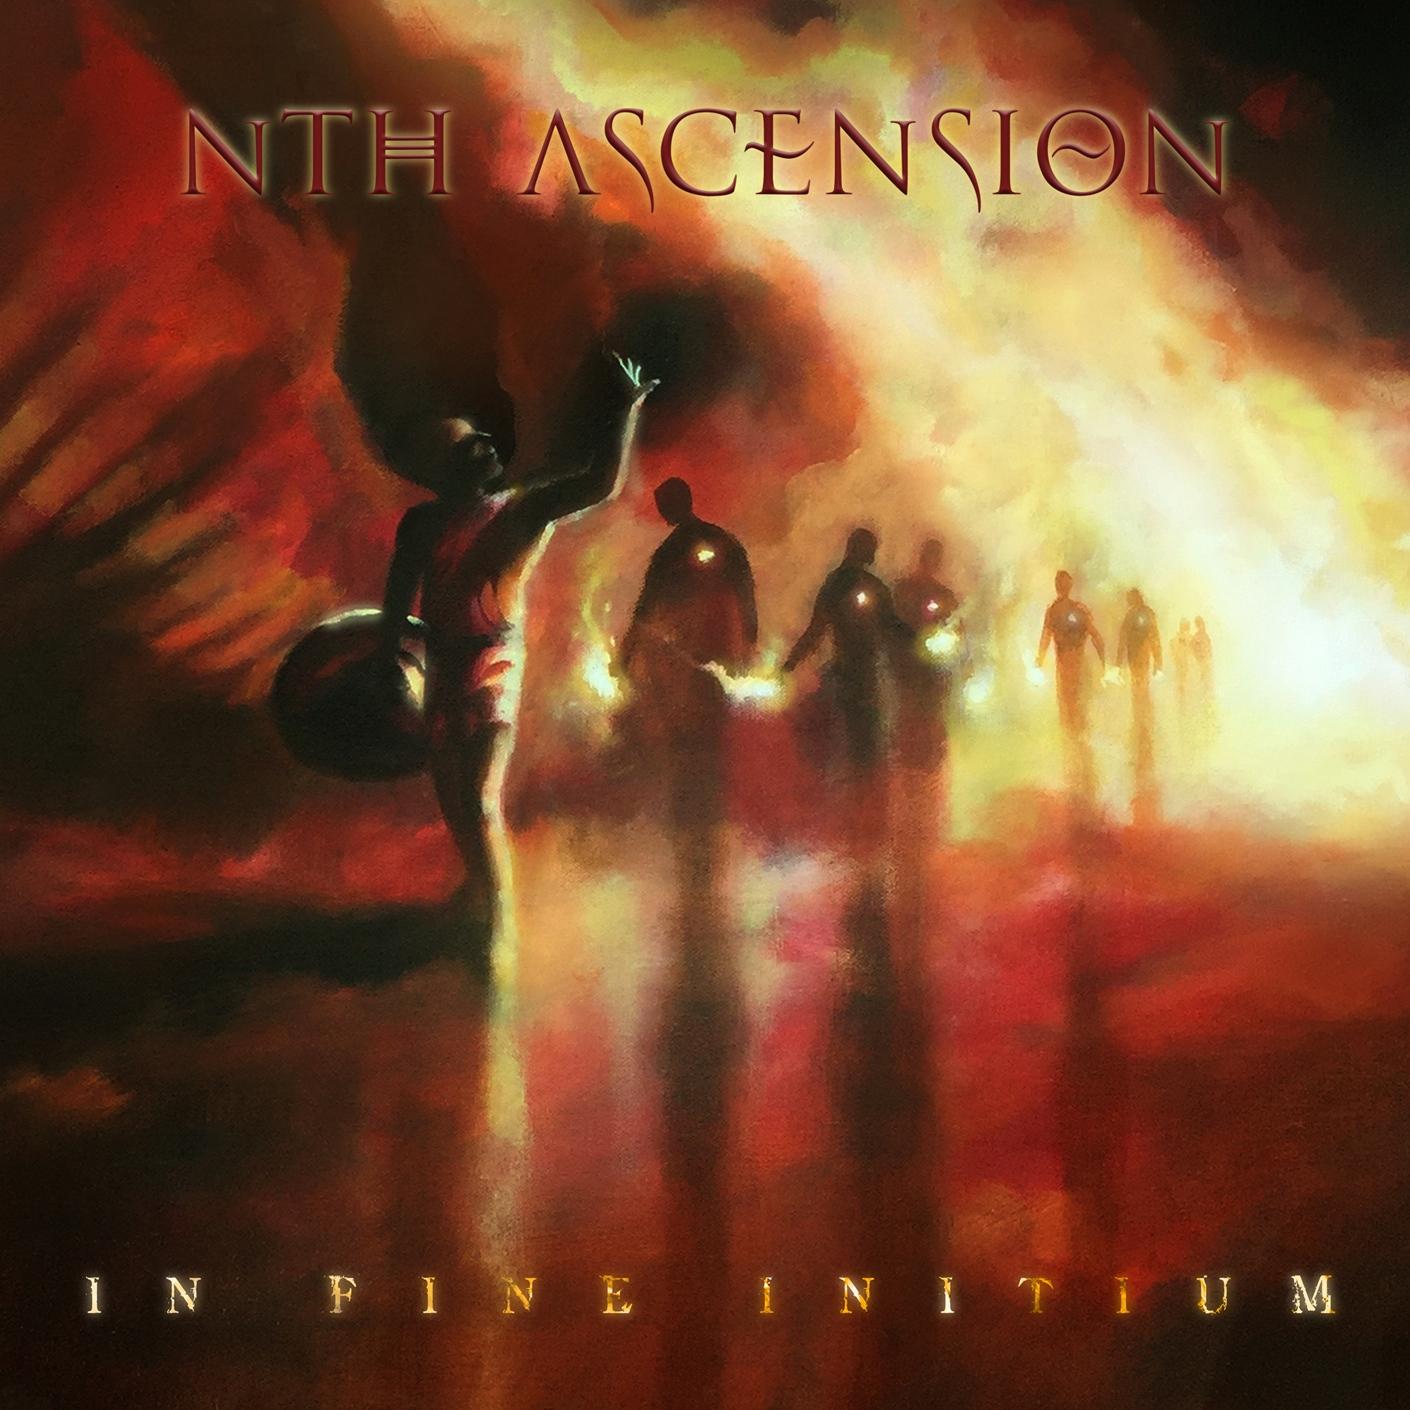 nth_ascension_-_in_fine_initium